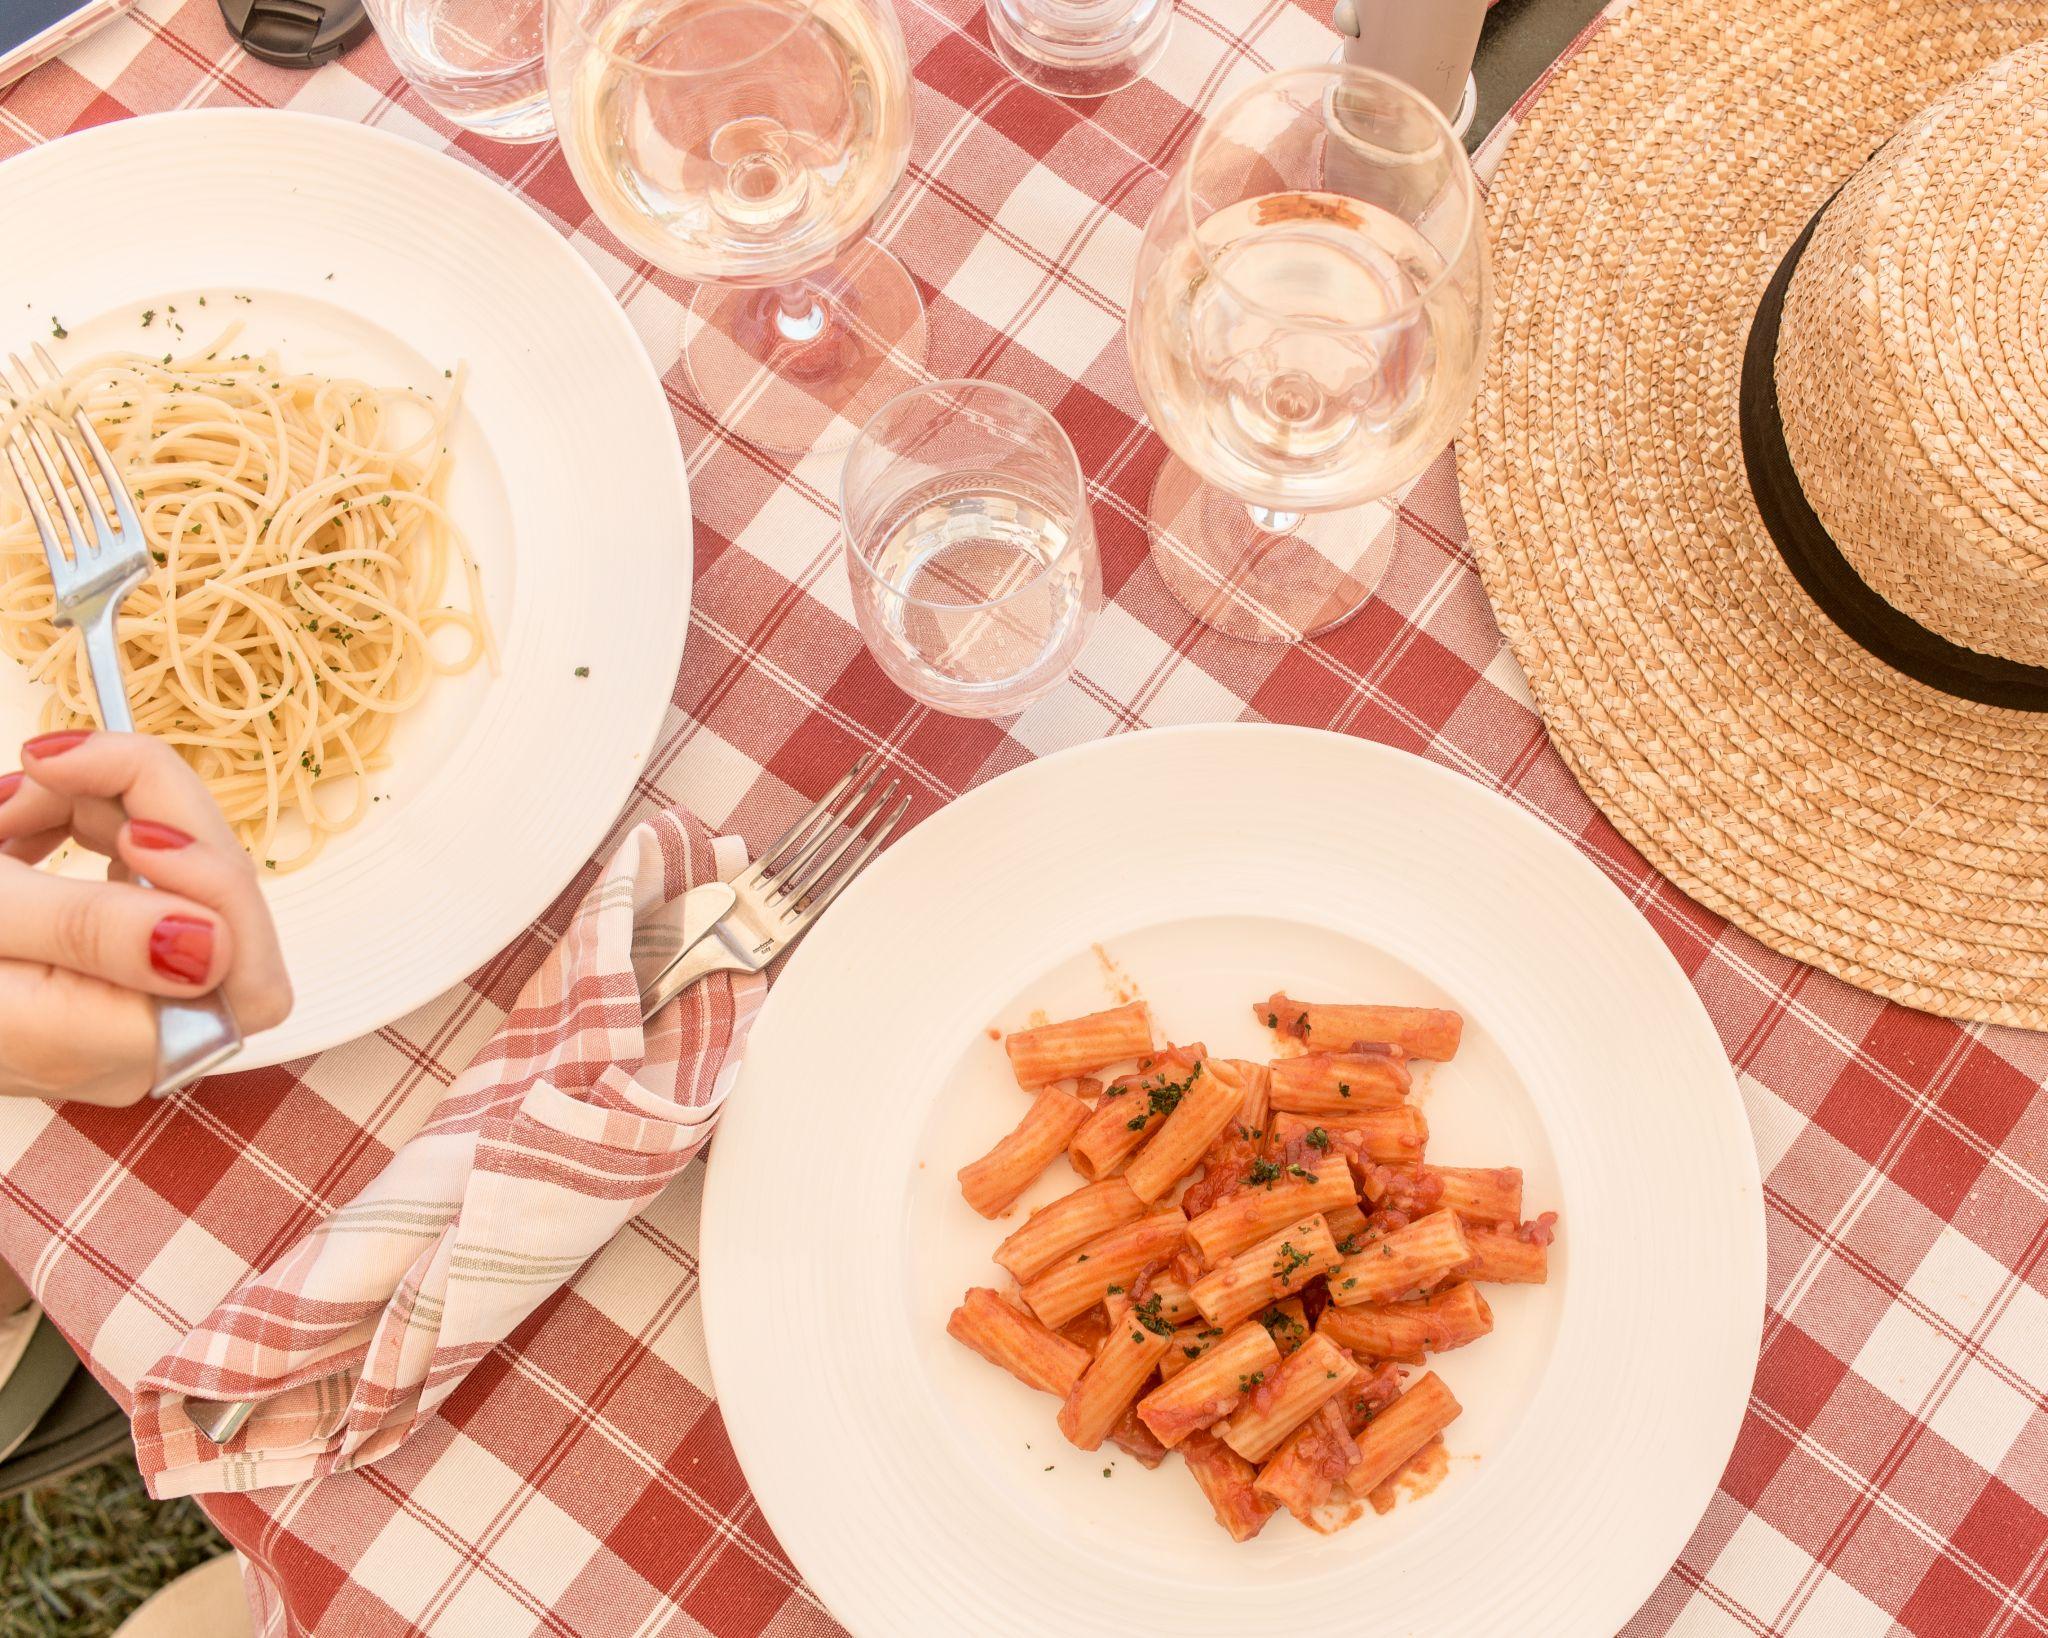 Adler Thermae Hotel Tuscany Hospitality Brand Hotel Travel Photography pasta